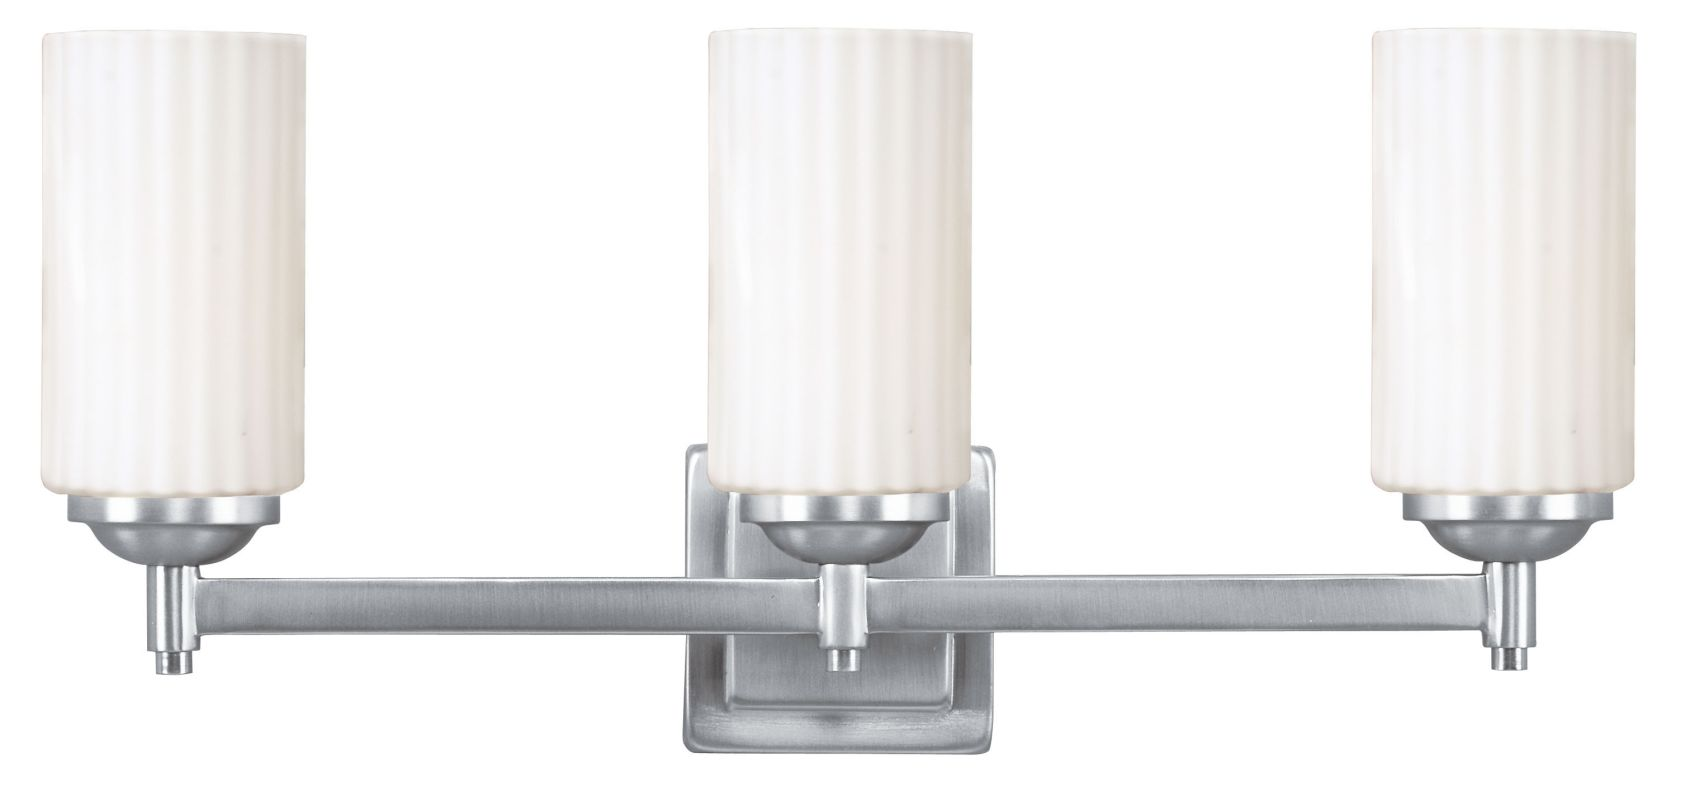 Livex Oldwick Modern Brushed Nickel 3 Light Bathroom: Livex Lighting 1423-91 Brushed Nickel Madison 3 Light